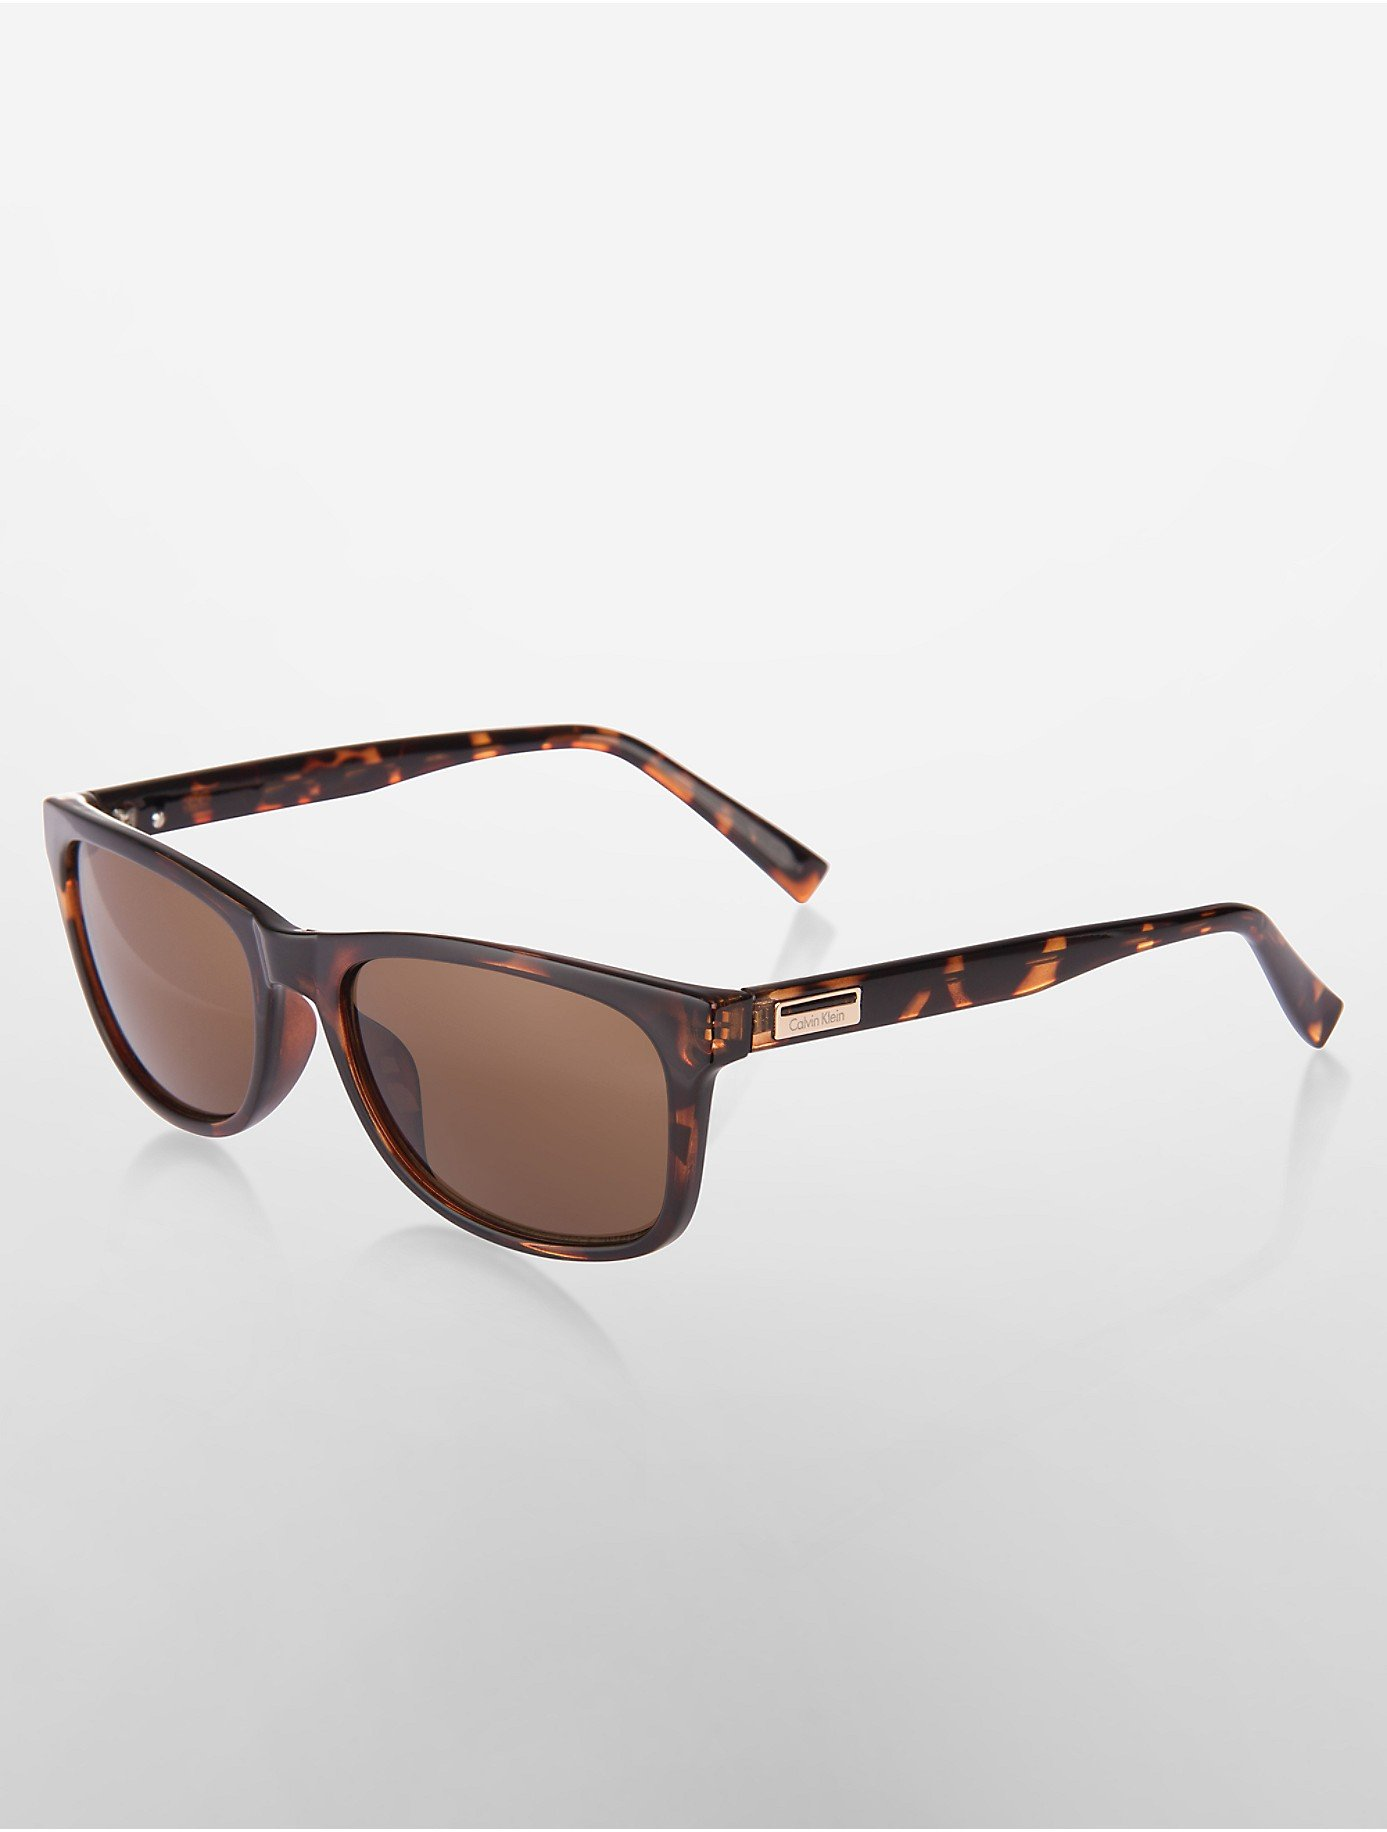 Calvin klein White Label Wayfarer Sunglasses in Brown (TORTOISE) | Lyst